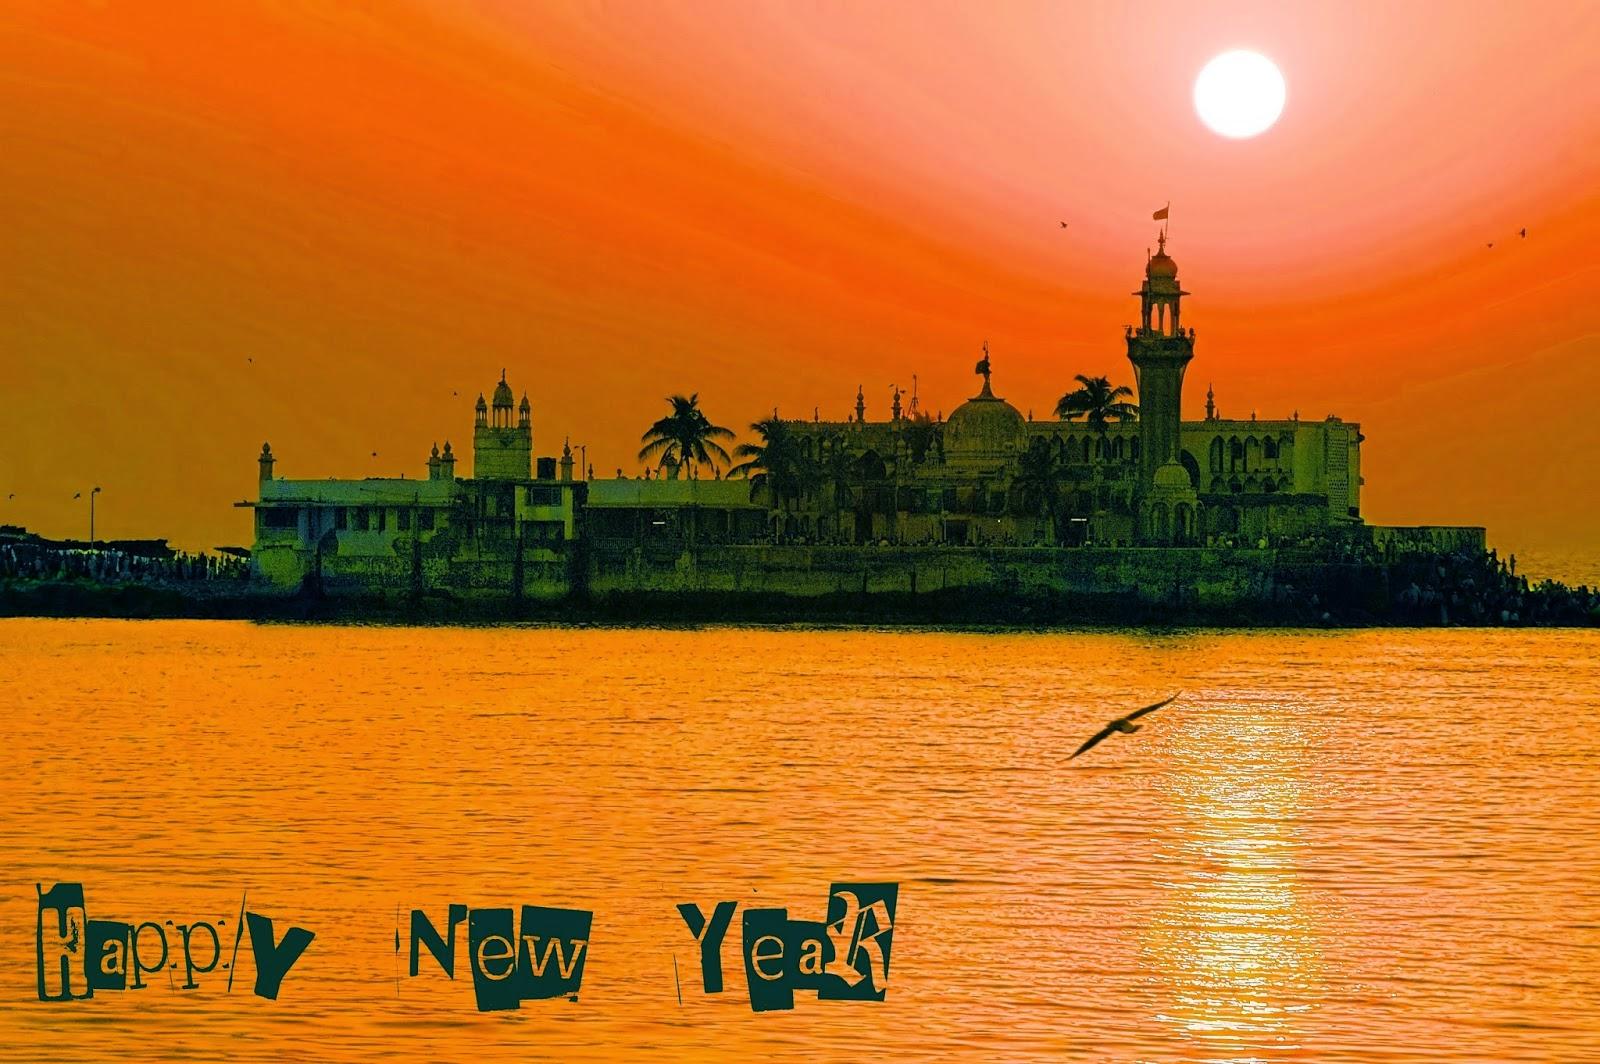 Happy New Year 2016 Punjabi Greetings Wishes